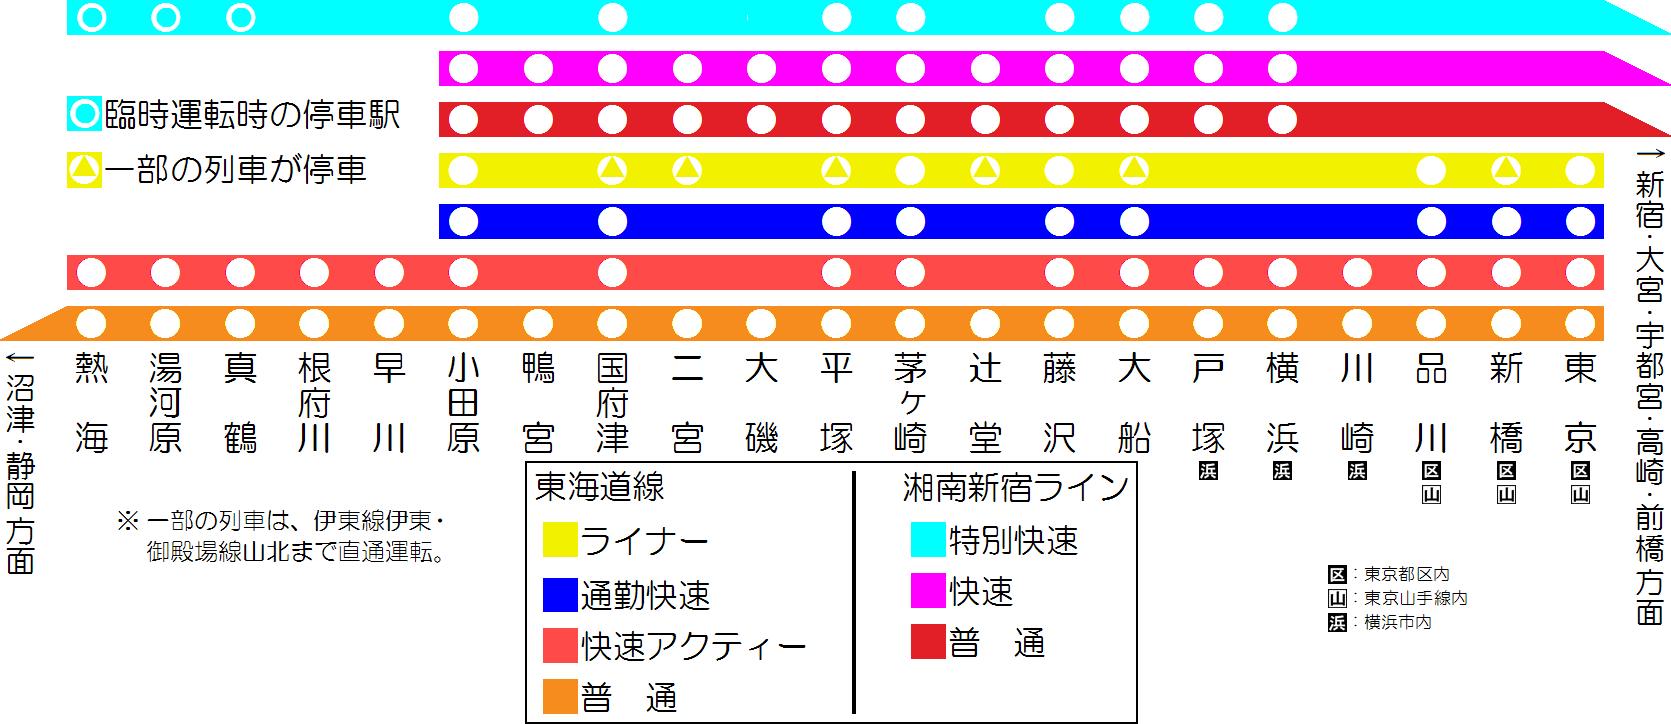 tokyo jr map with Tokaido   Pany on Skmap2 additionally Keiyo map additionally English027 besides Access moreover File Yamanote.